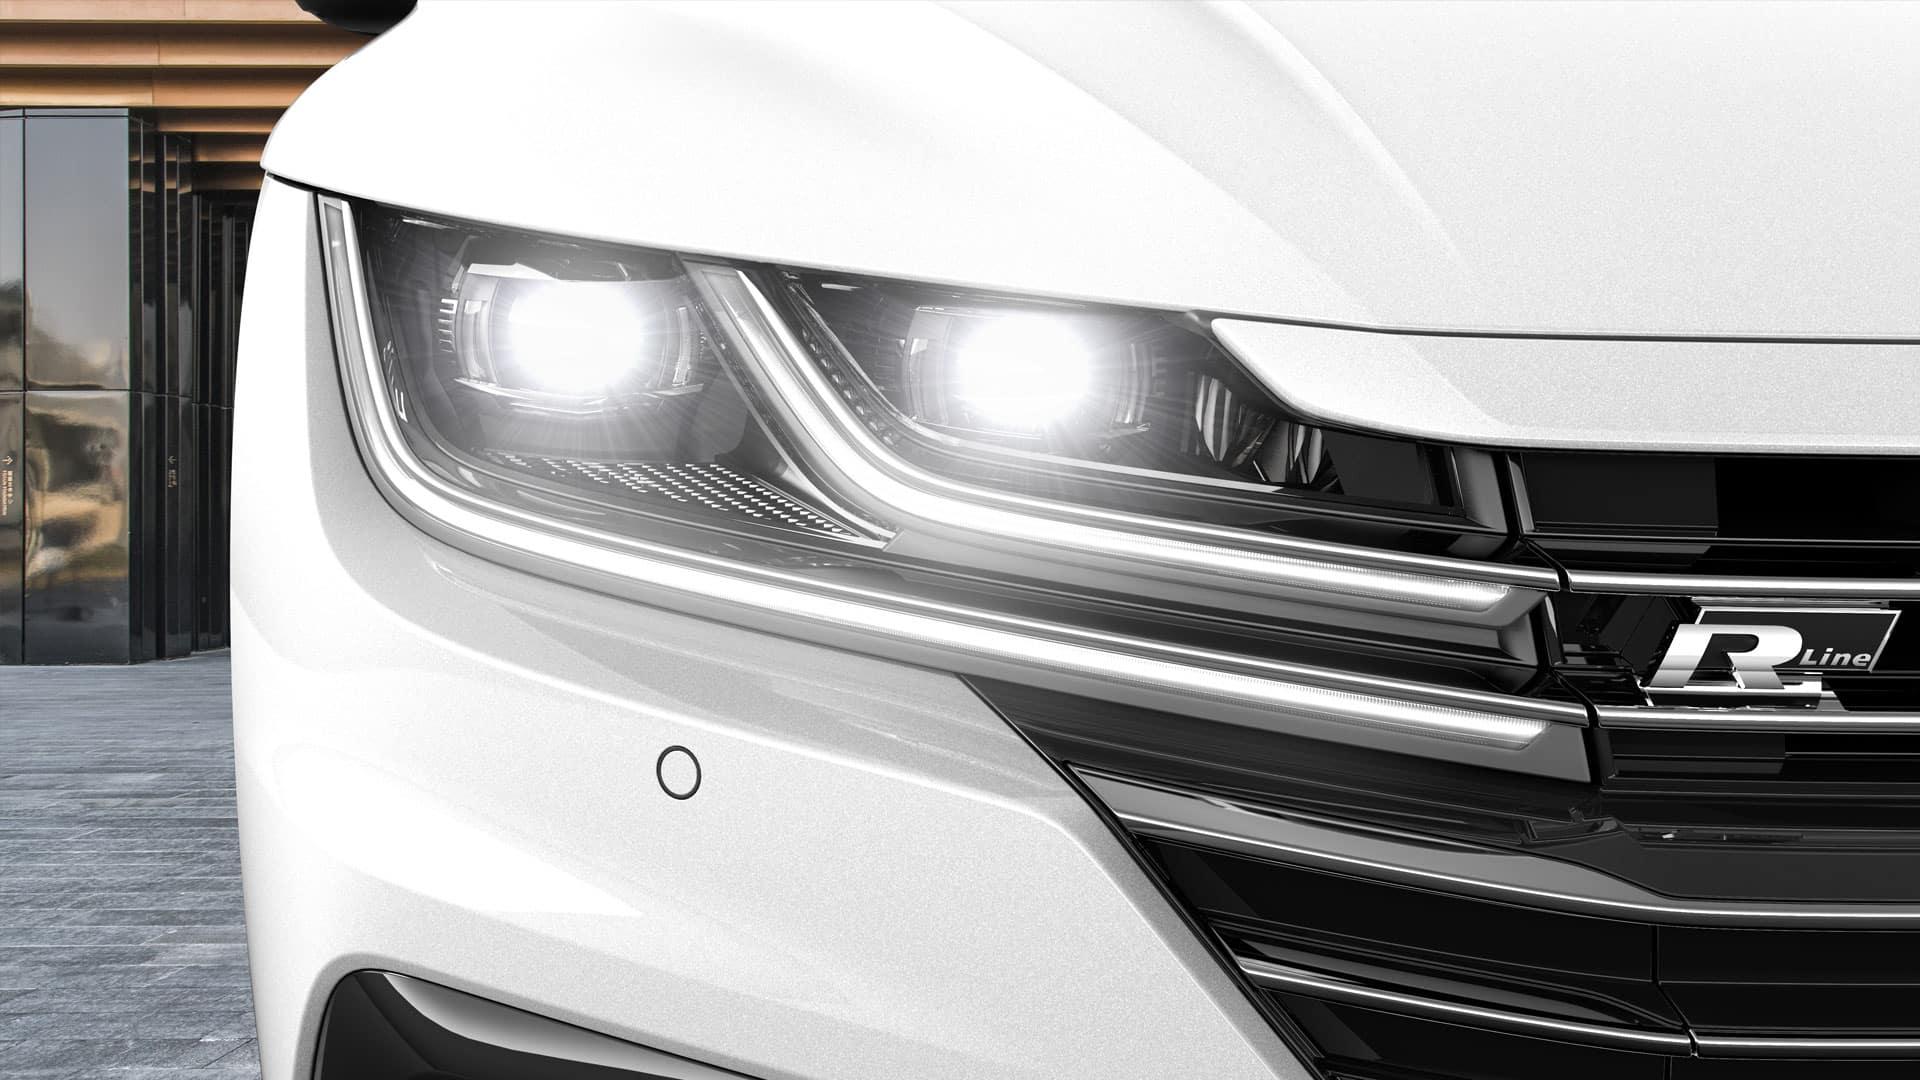 White Arteon headlights